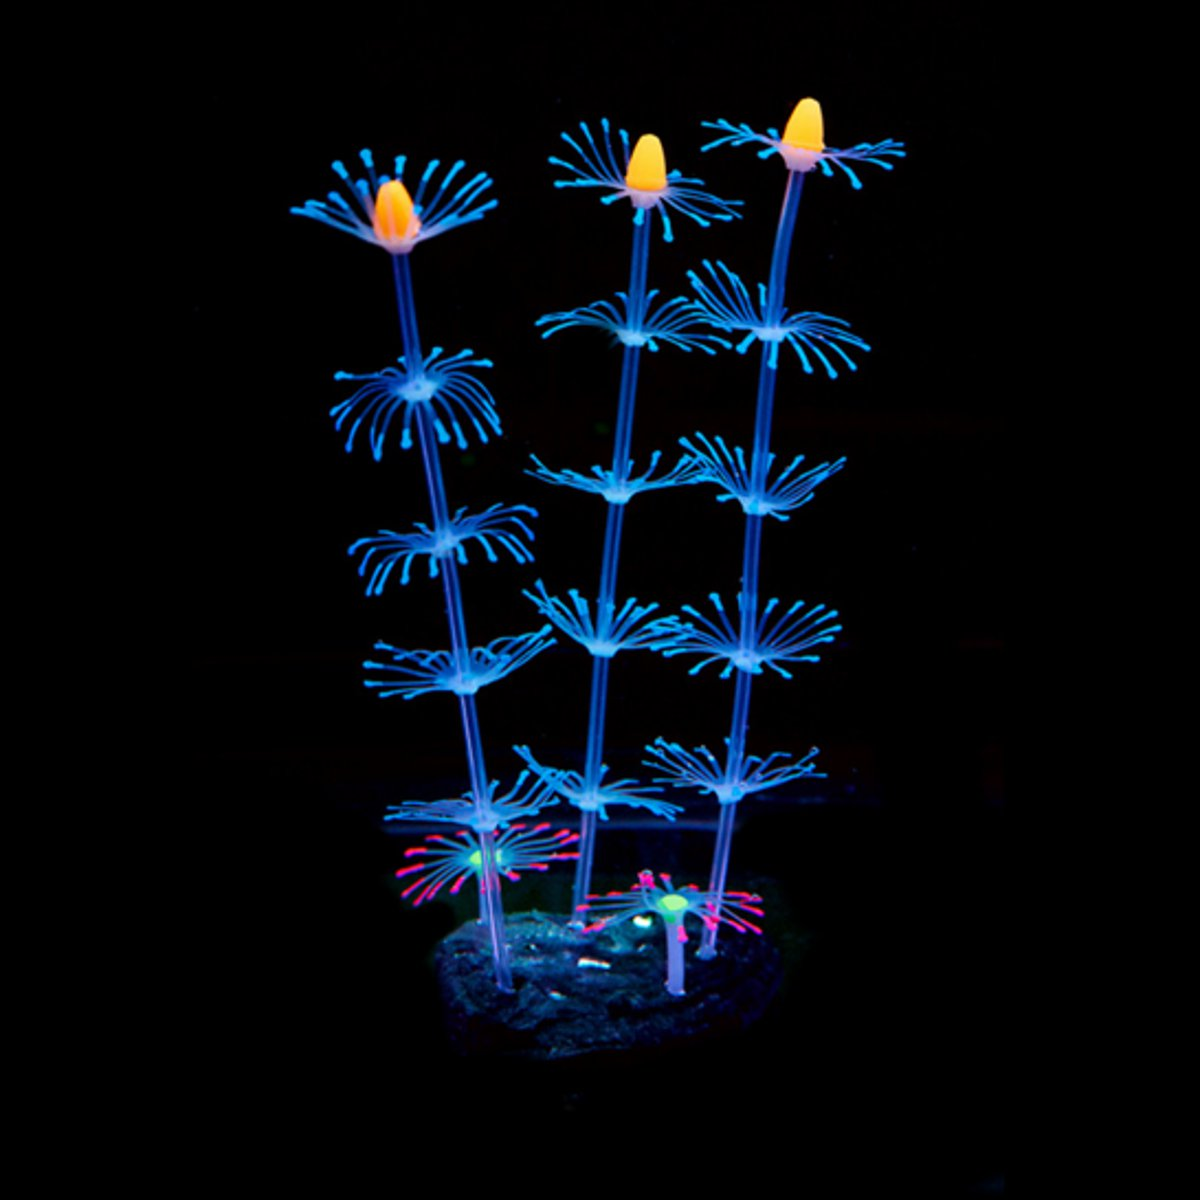 Moaere Fluorescent Coral Plant Aquarium Decoration Glow In The Dark Fish Tank Ornament